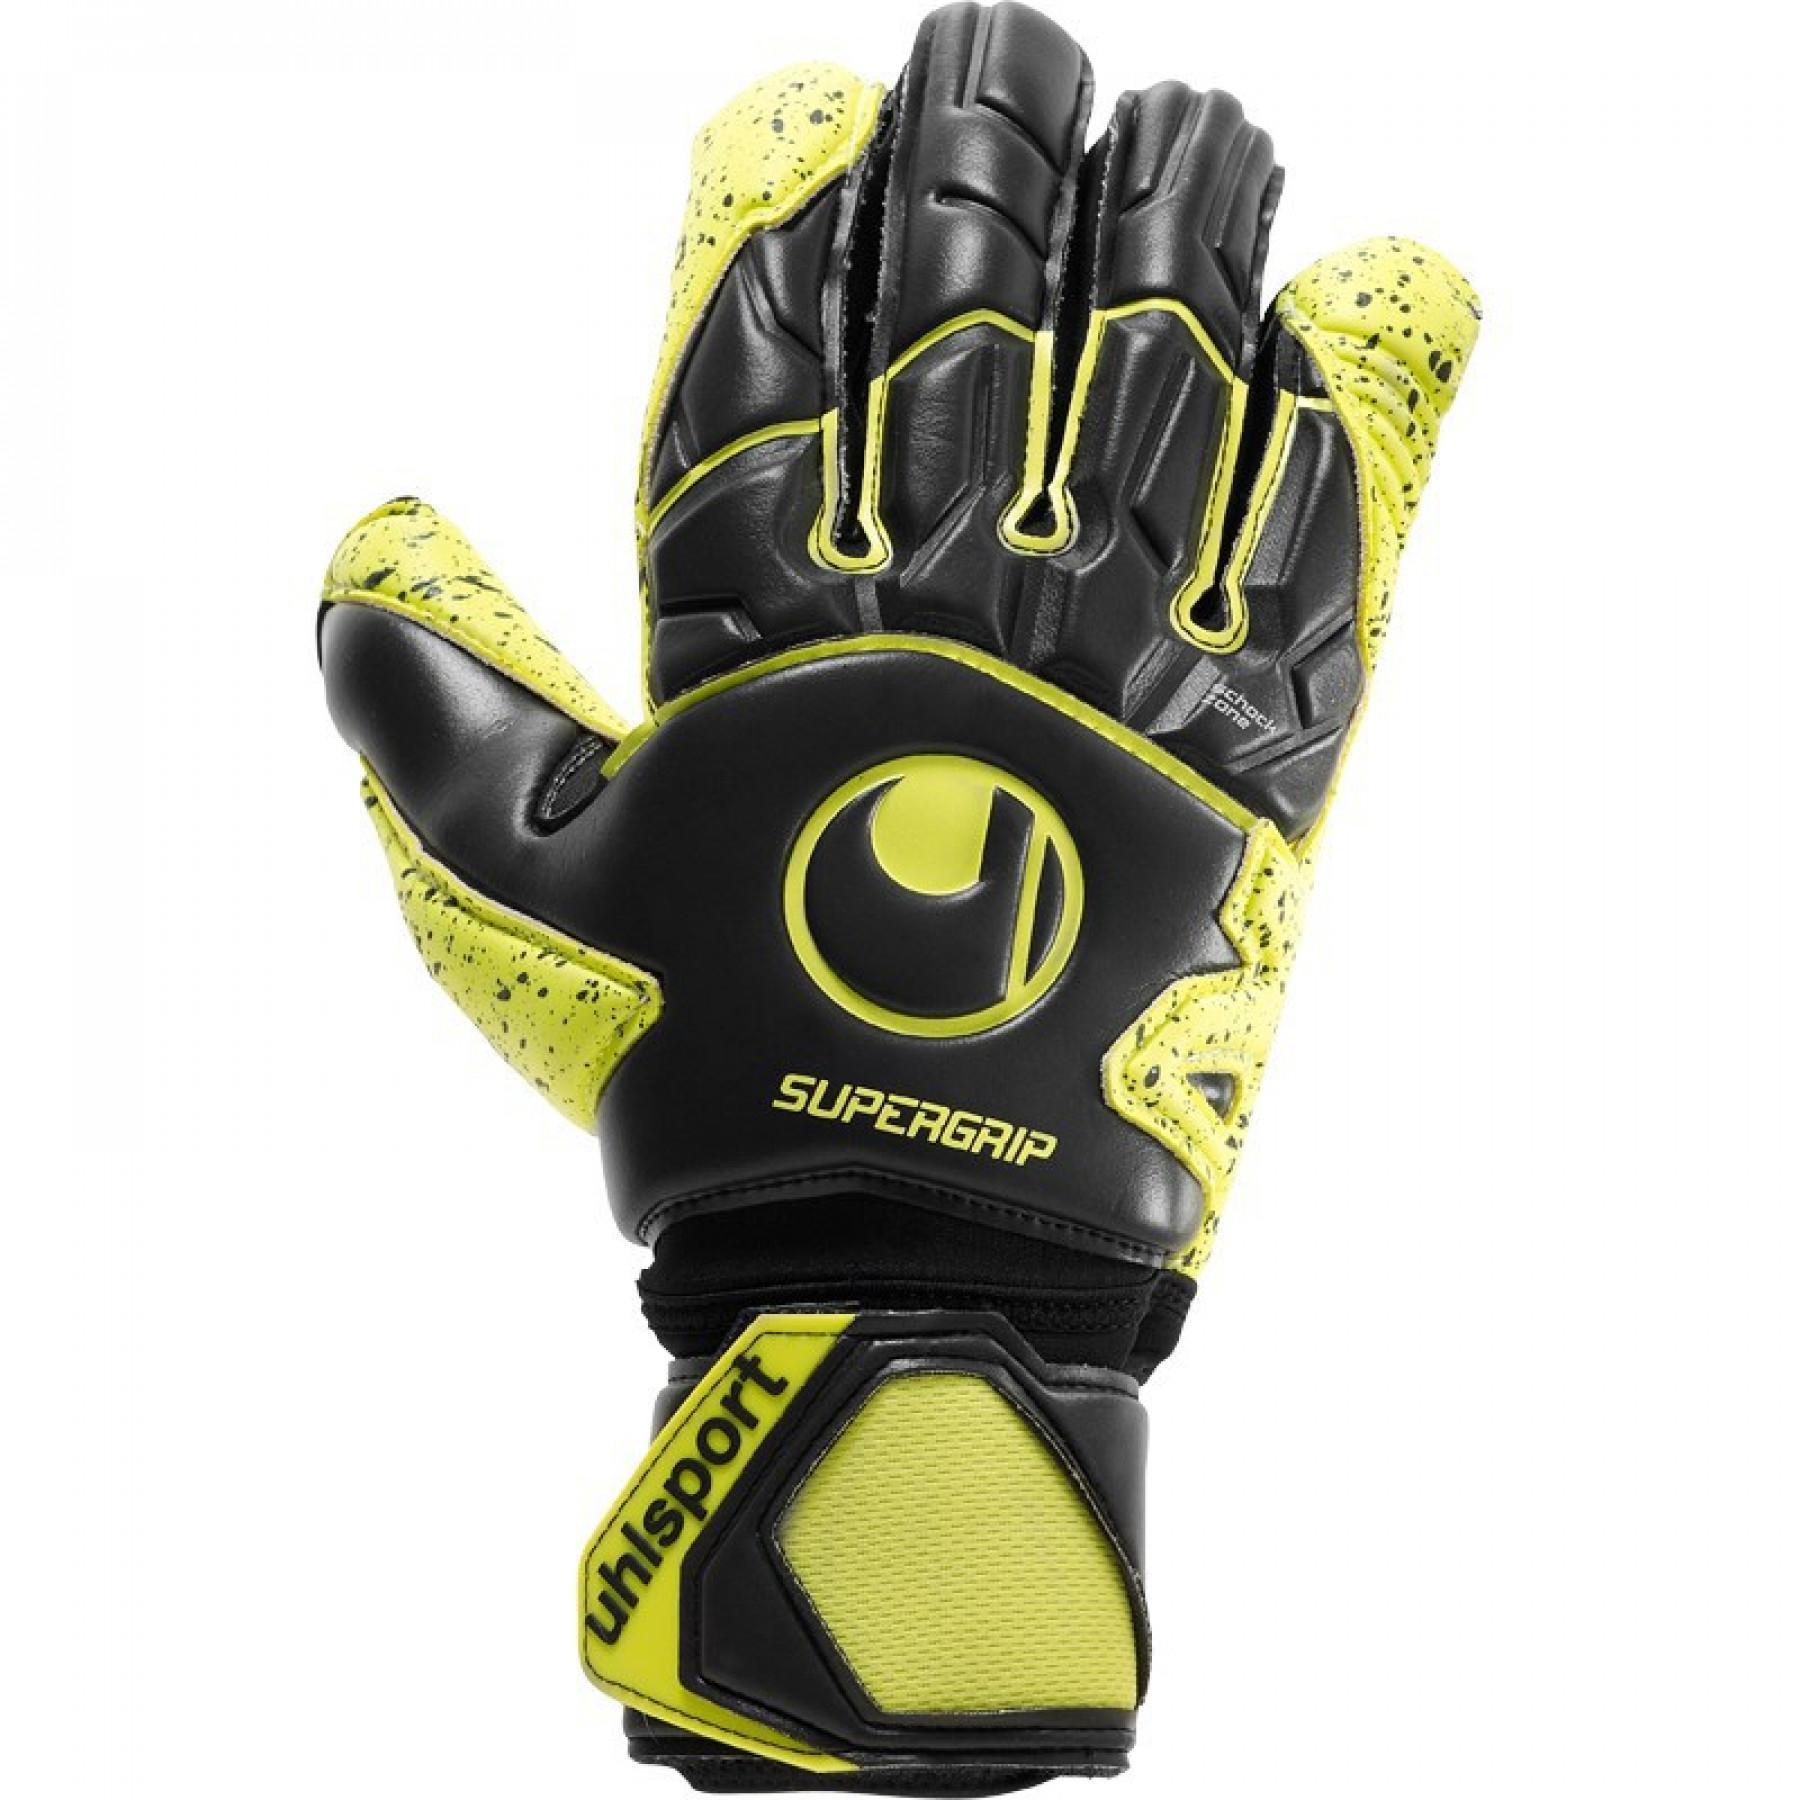 Uhlsport Supergrip Flex Frame Carbon Goalie Handschoenen